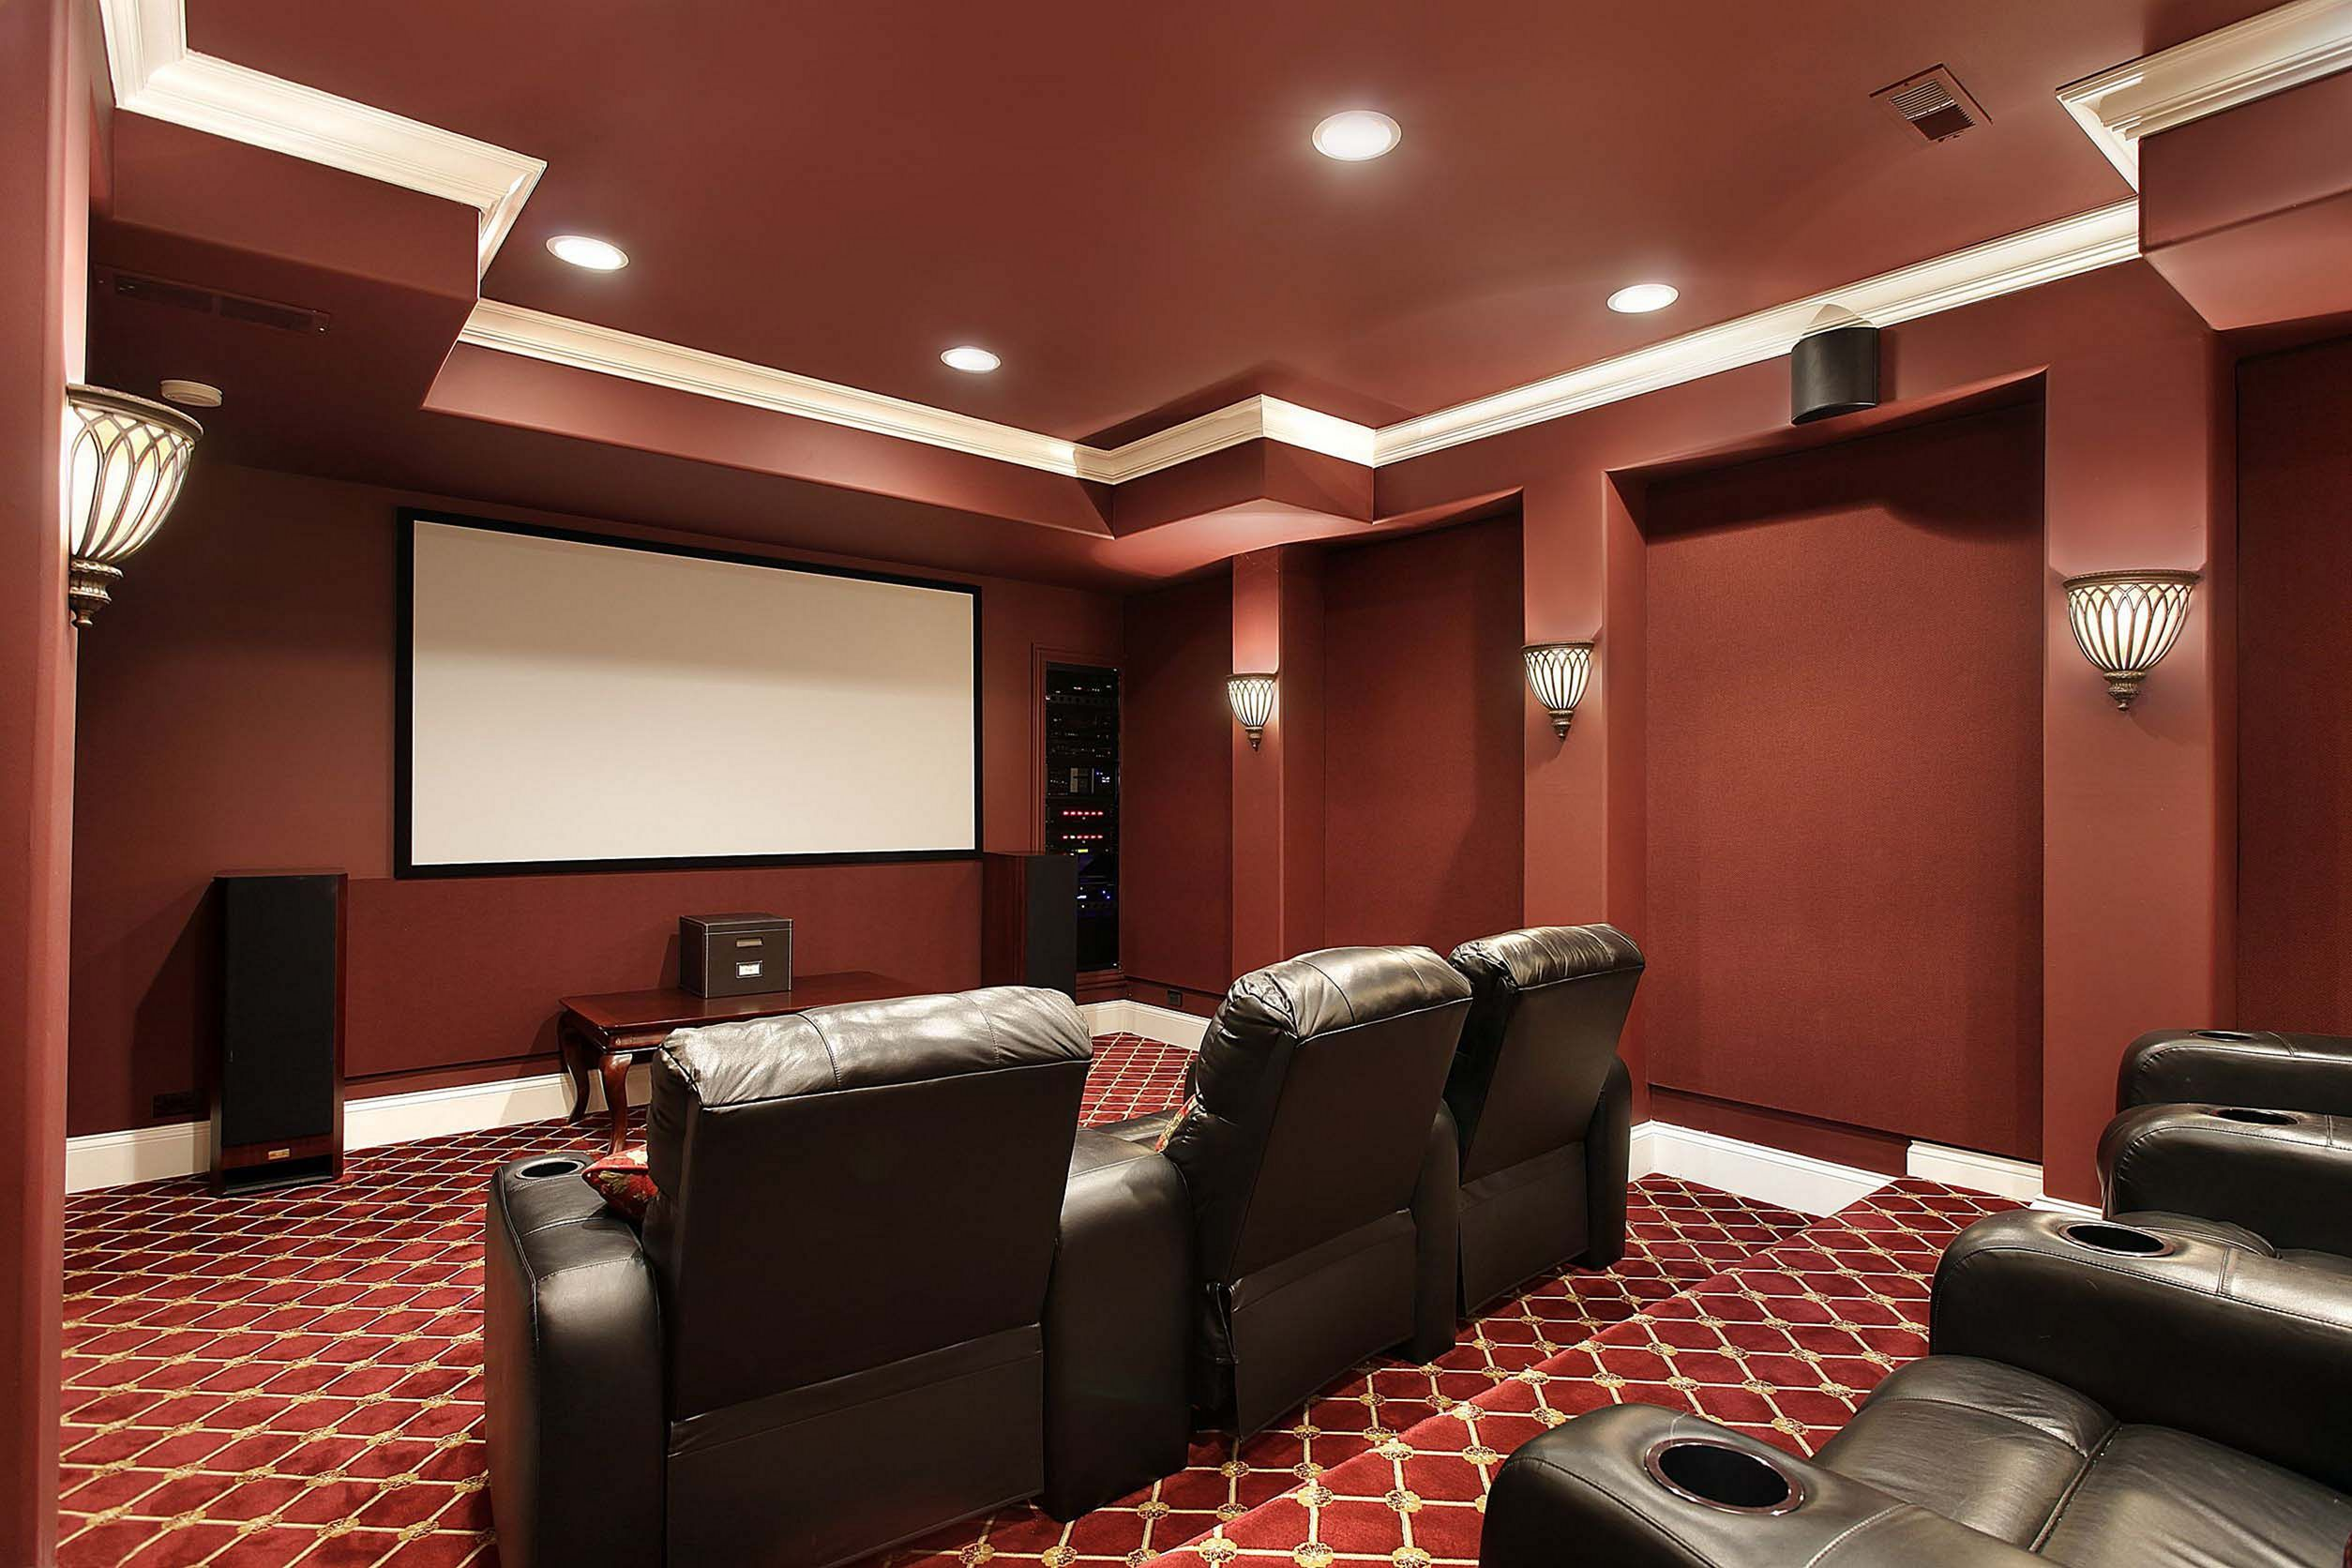 Inspiring Best 25 Home Entertainment Design Ideas For Inspiration Https